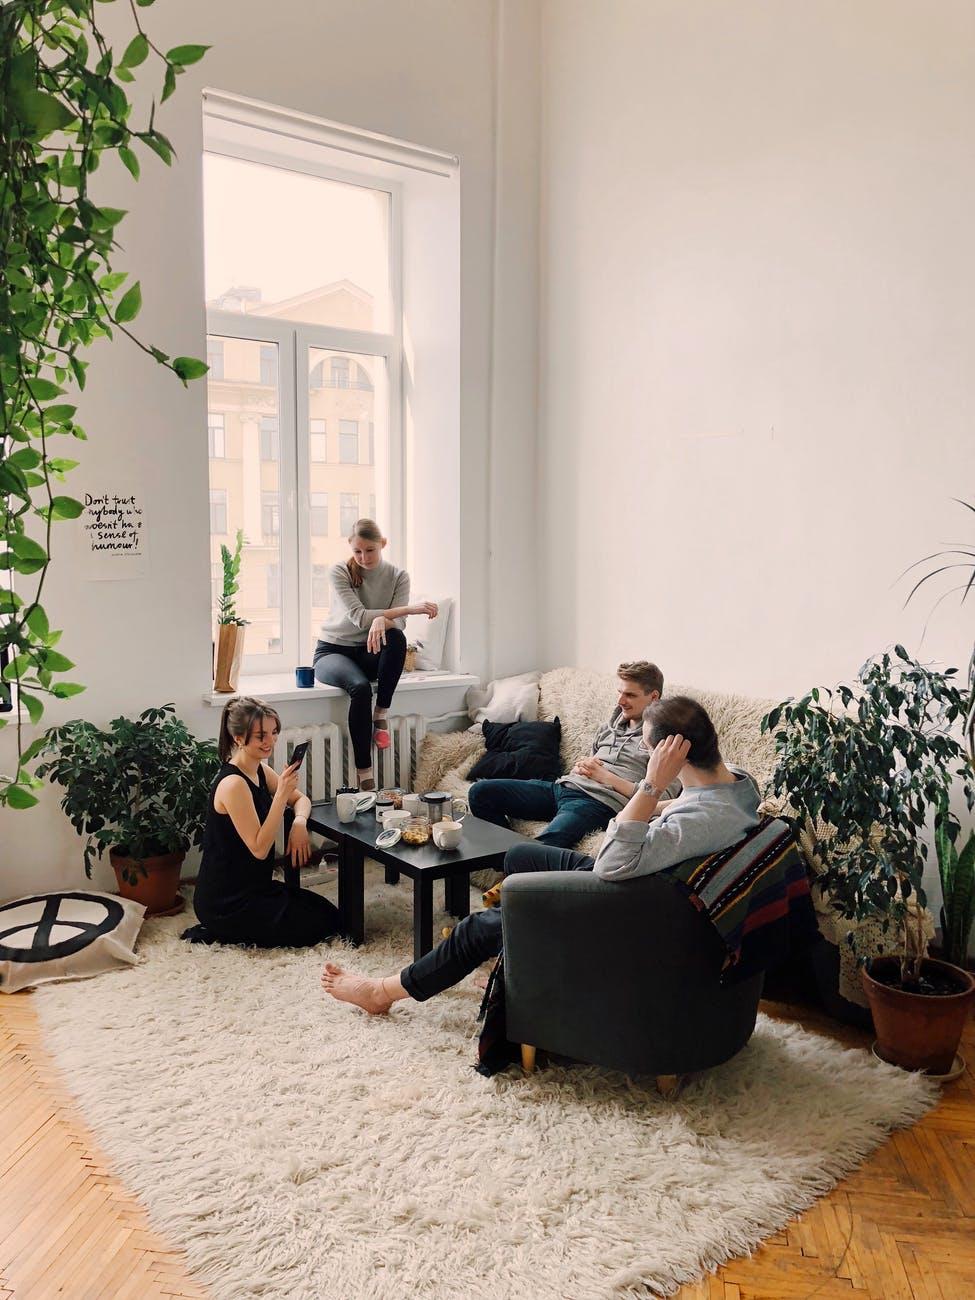 people gathered inside house sitting on sofa